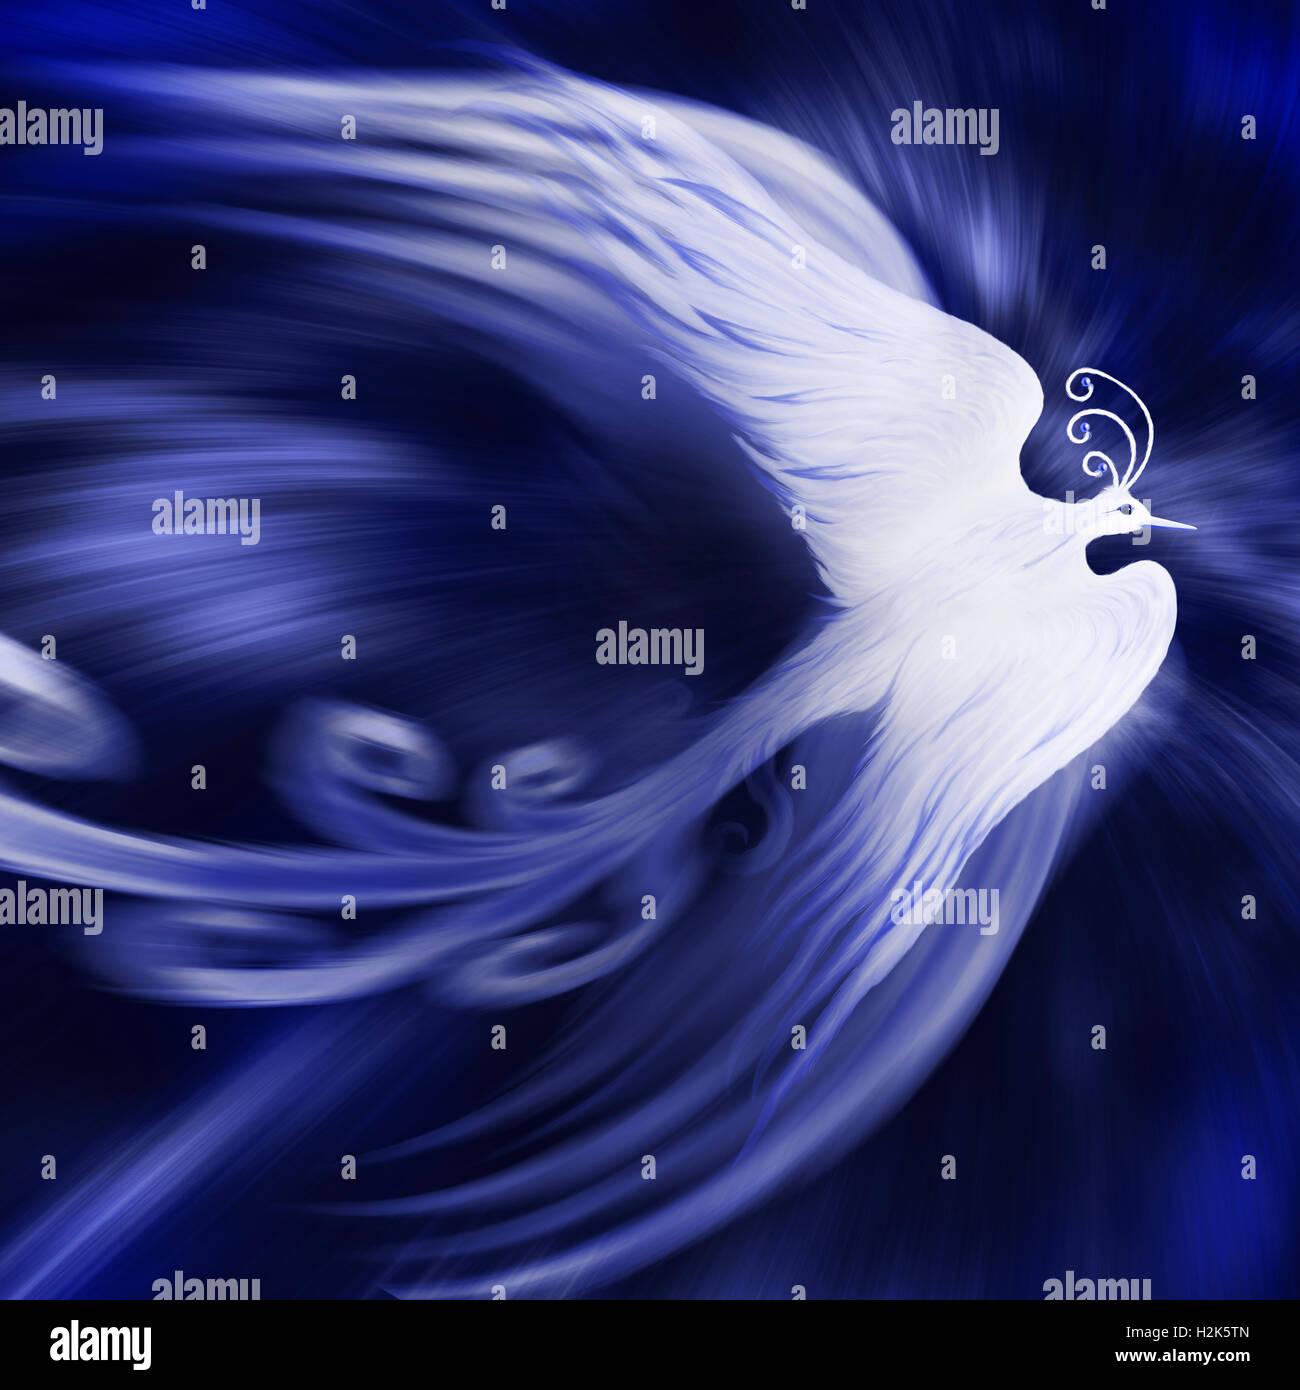 Magical phoenix bird on blue cosmic background, illustration - Stock Image